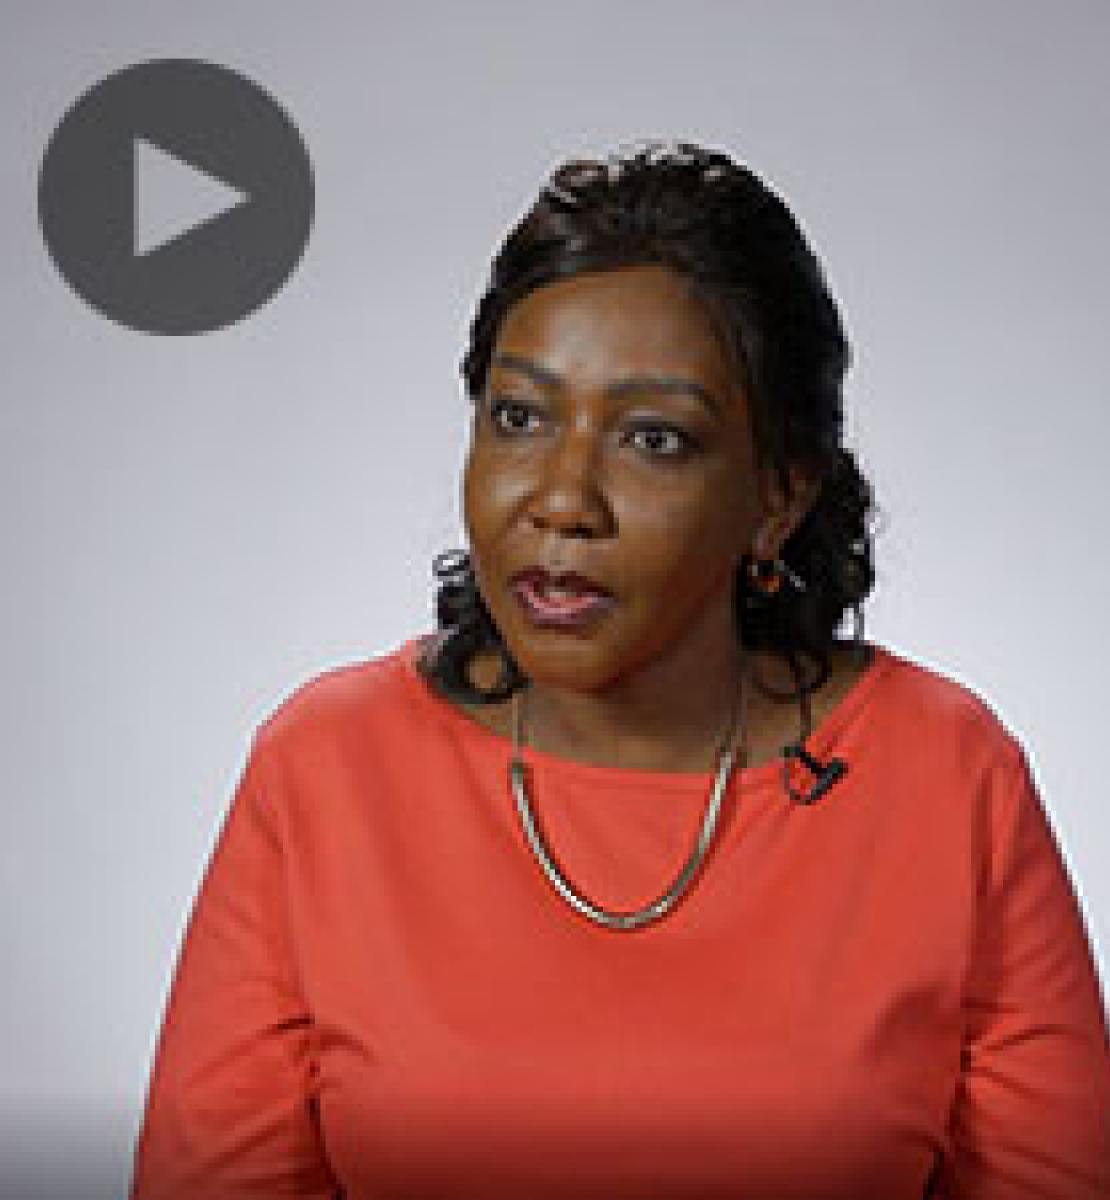 Screenshot from video message shows Resident Coordinator, Violet Kakyomya